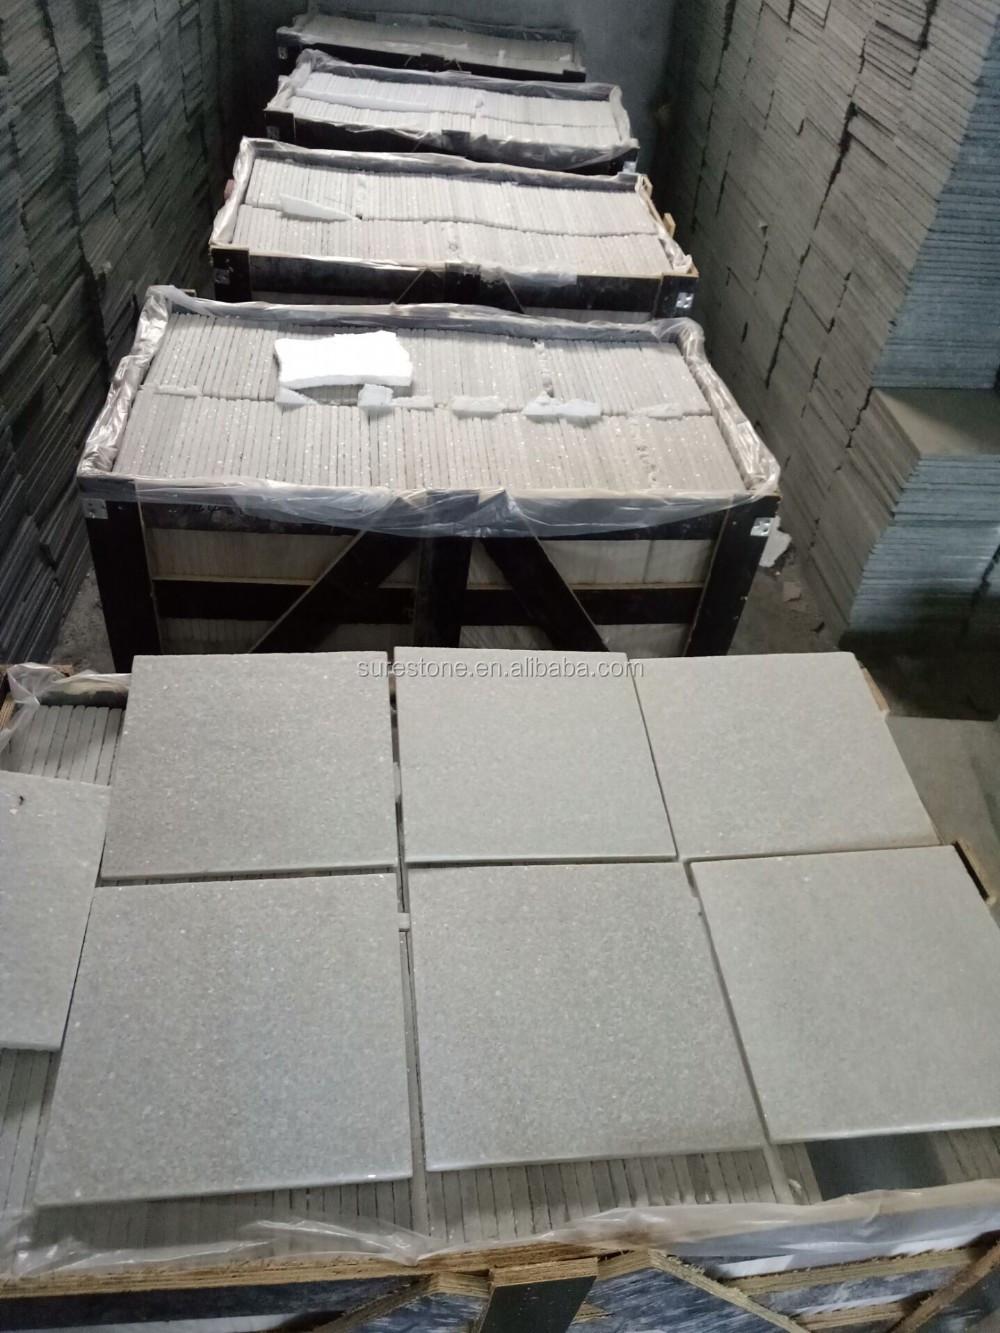 Natural white quartzite flooring tiles flooring tiles and wall tiles natural white quartzite flooring tiles flooring tiles and wall tiles dailygadgetfo Choice Image